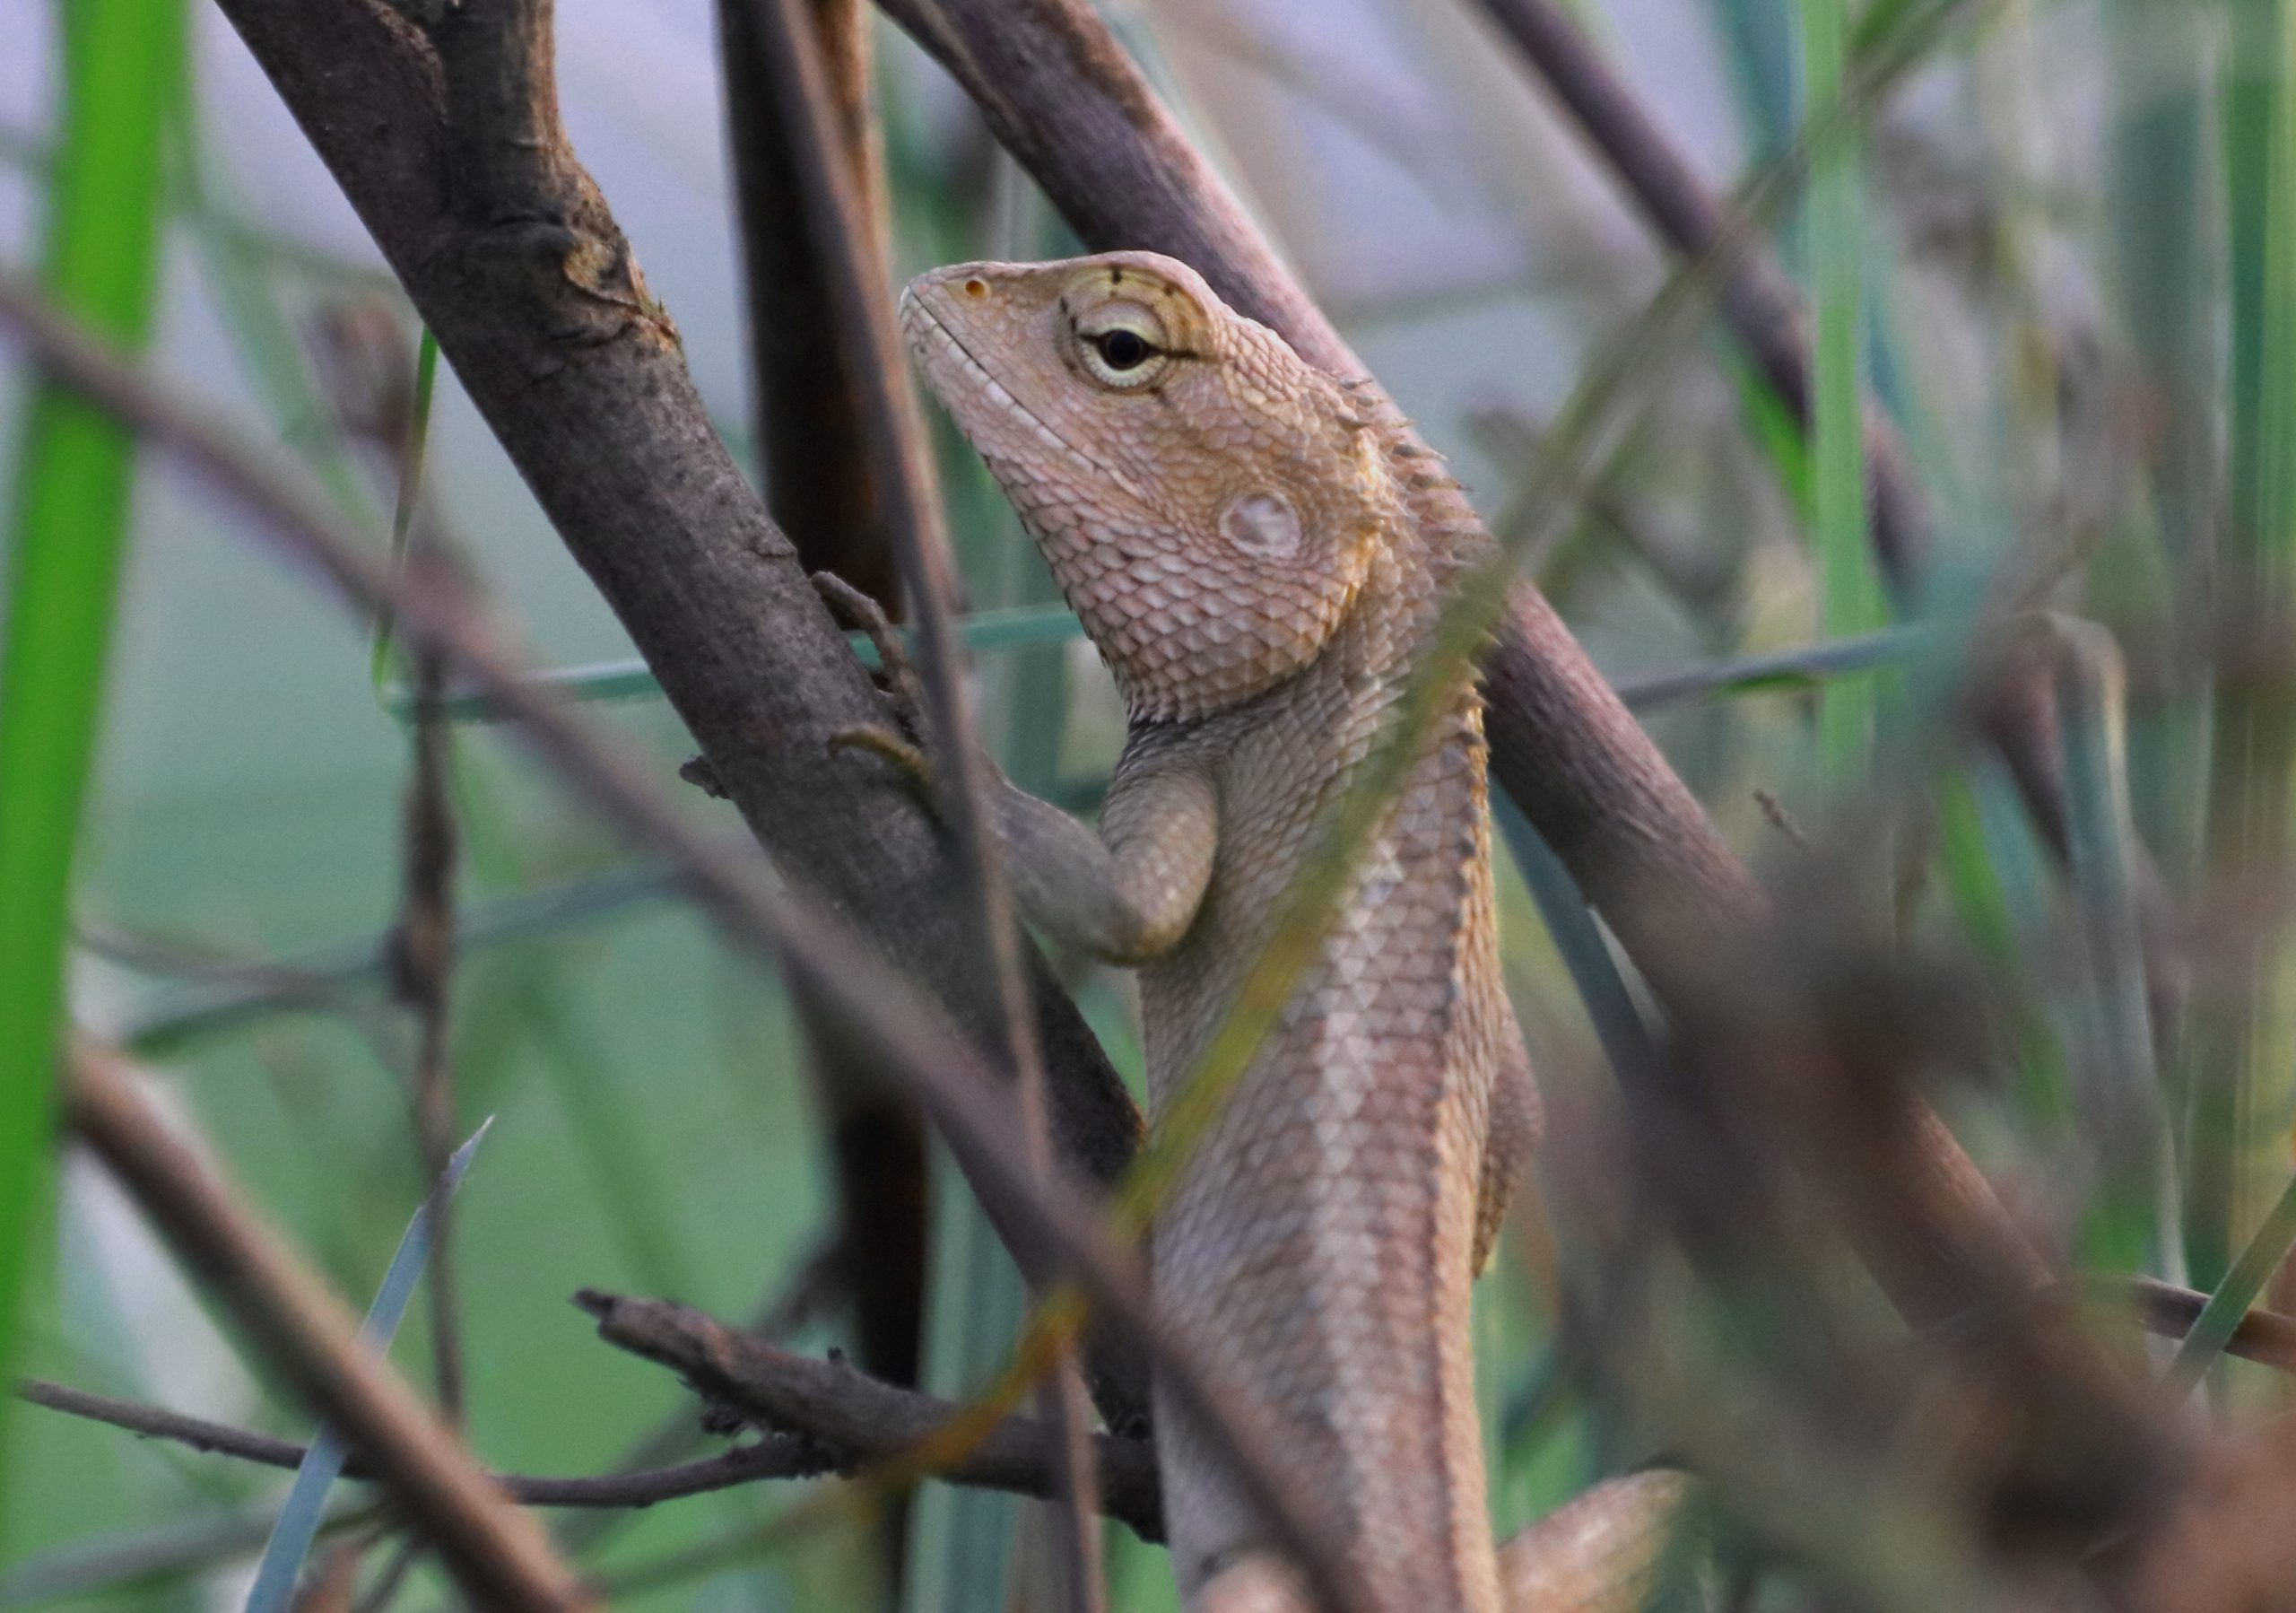 Garden lizard clawing on a branch